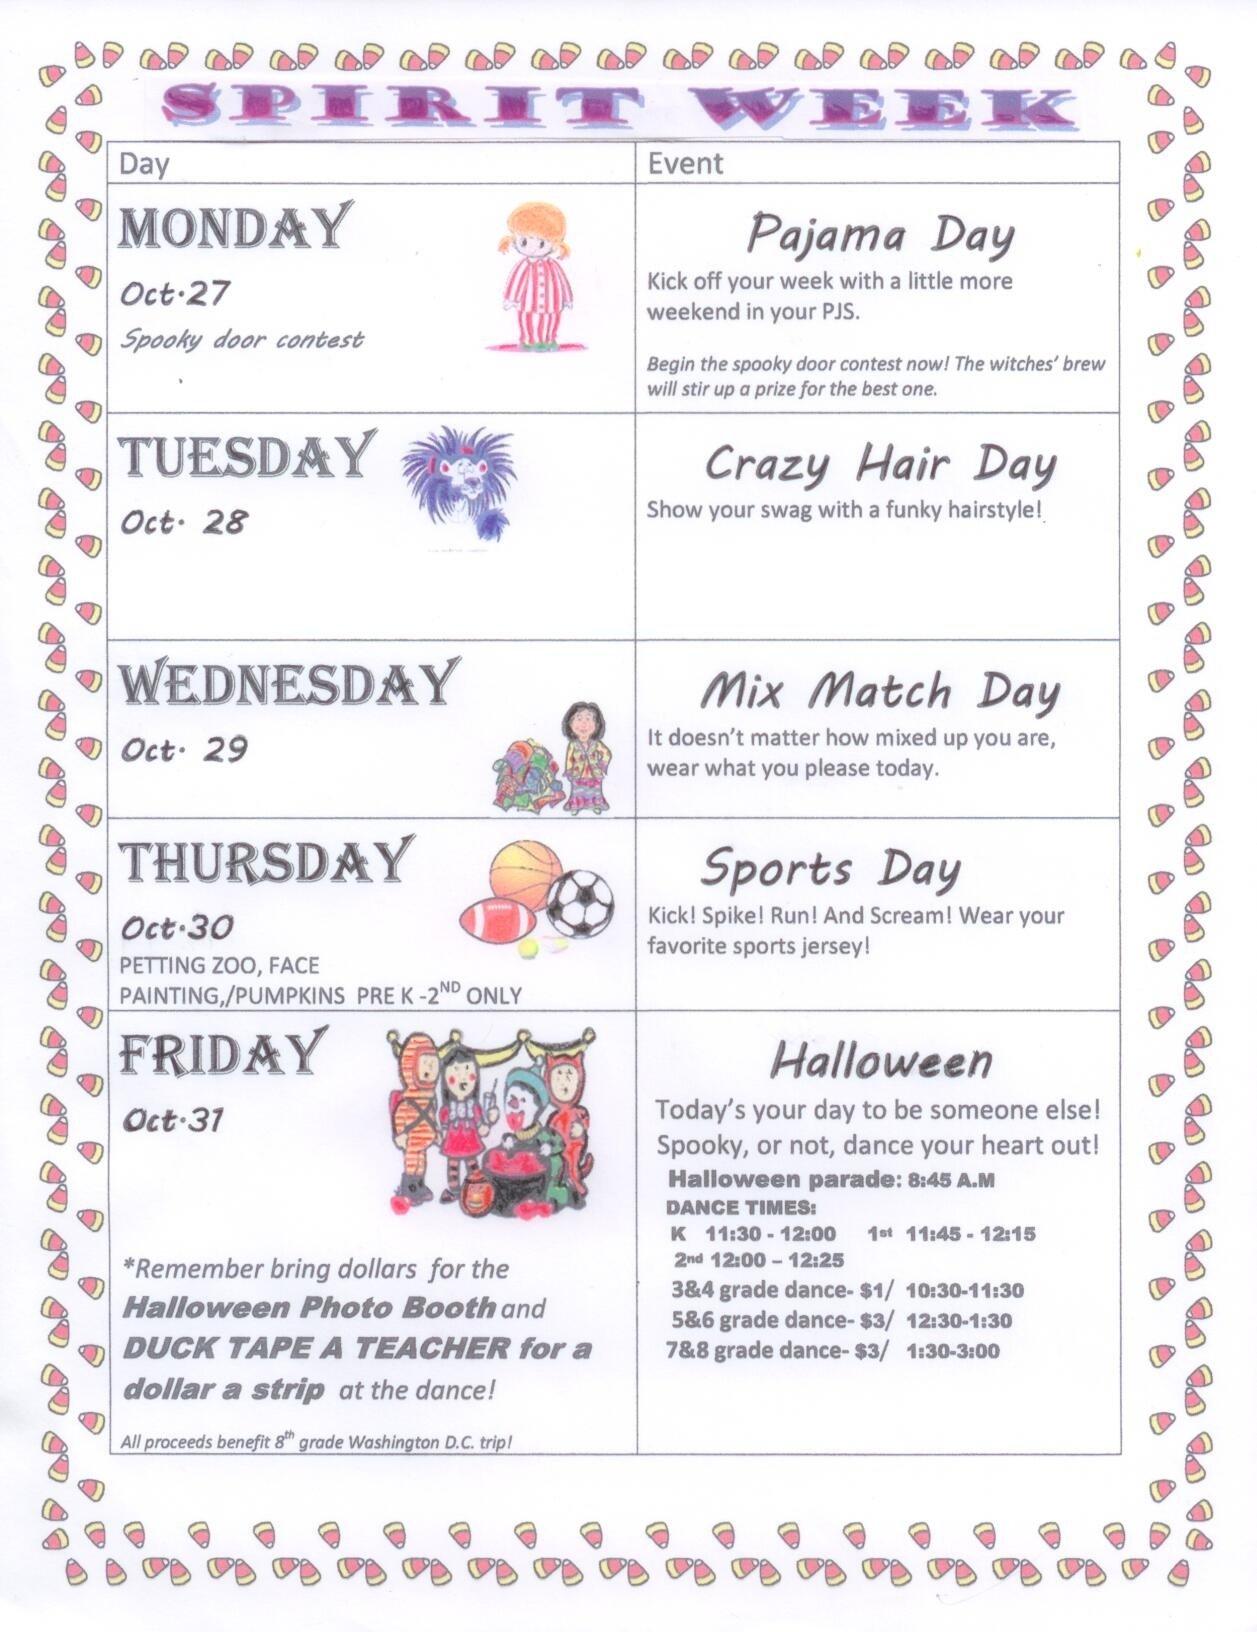 10 Most Recommended Spirit Week Ideas For Elementary School spirit week for preschool google search preschool spirit week